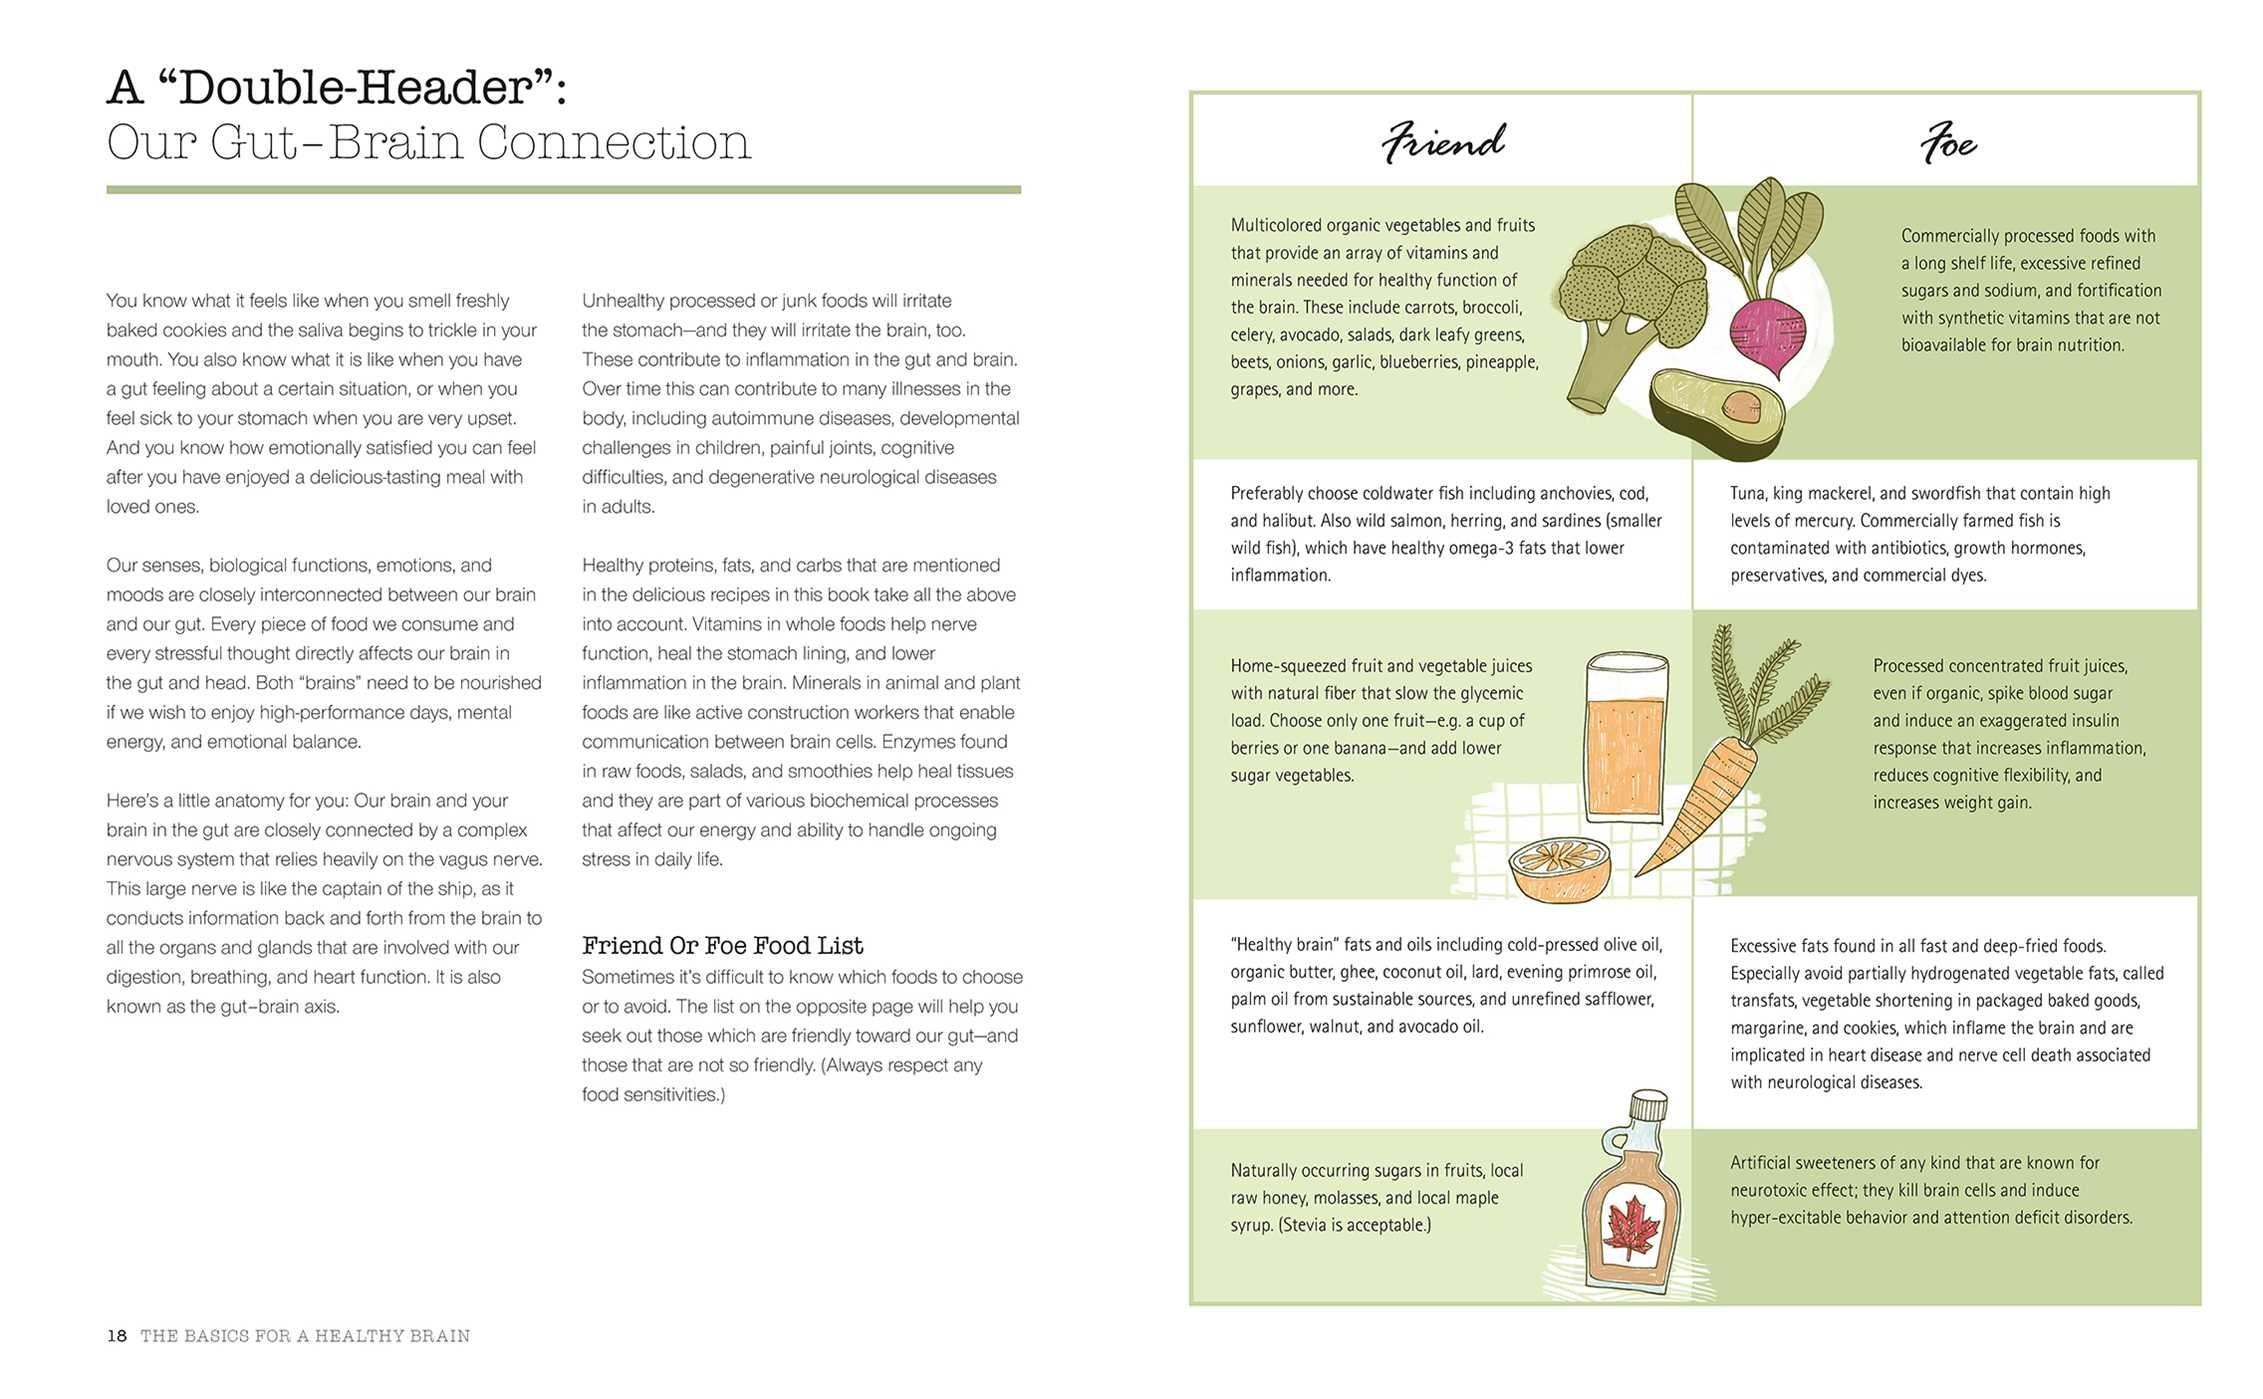 Nourish your brain cookbook 9781782494959.in01